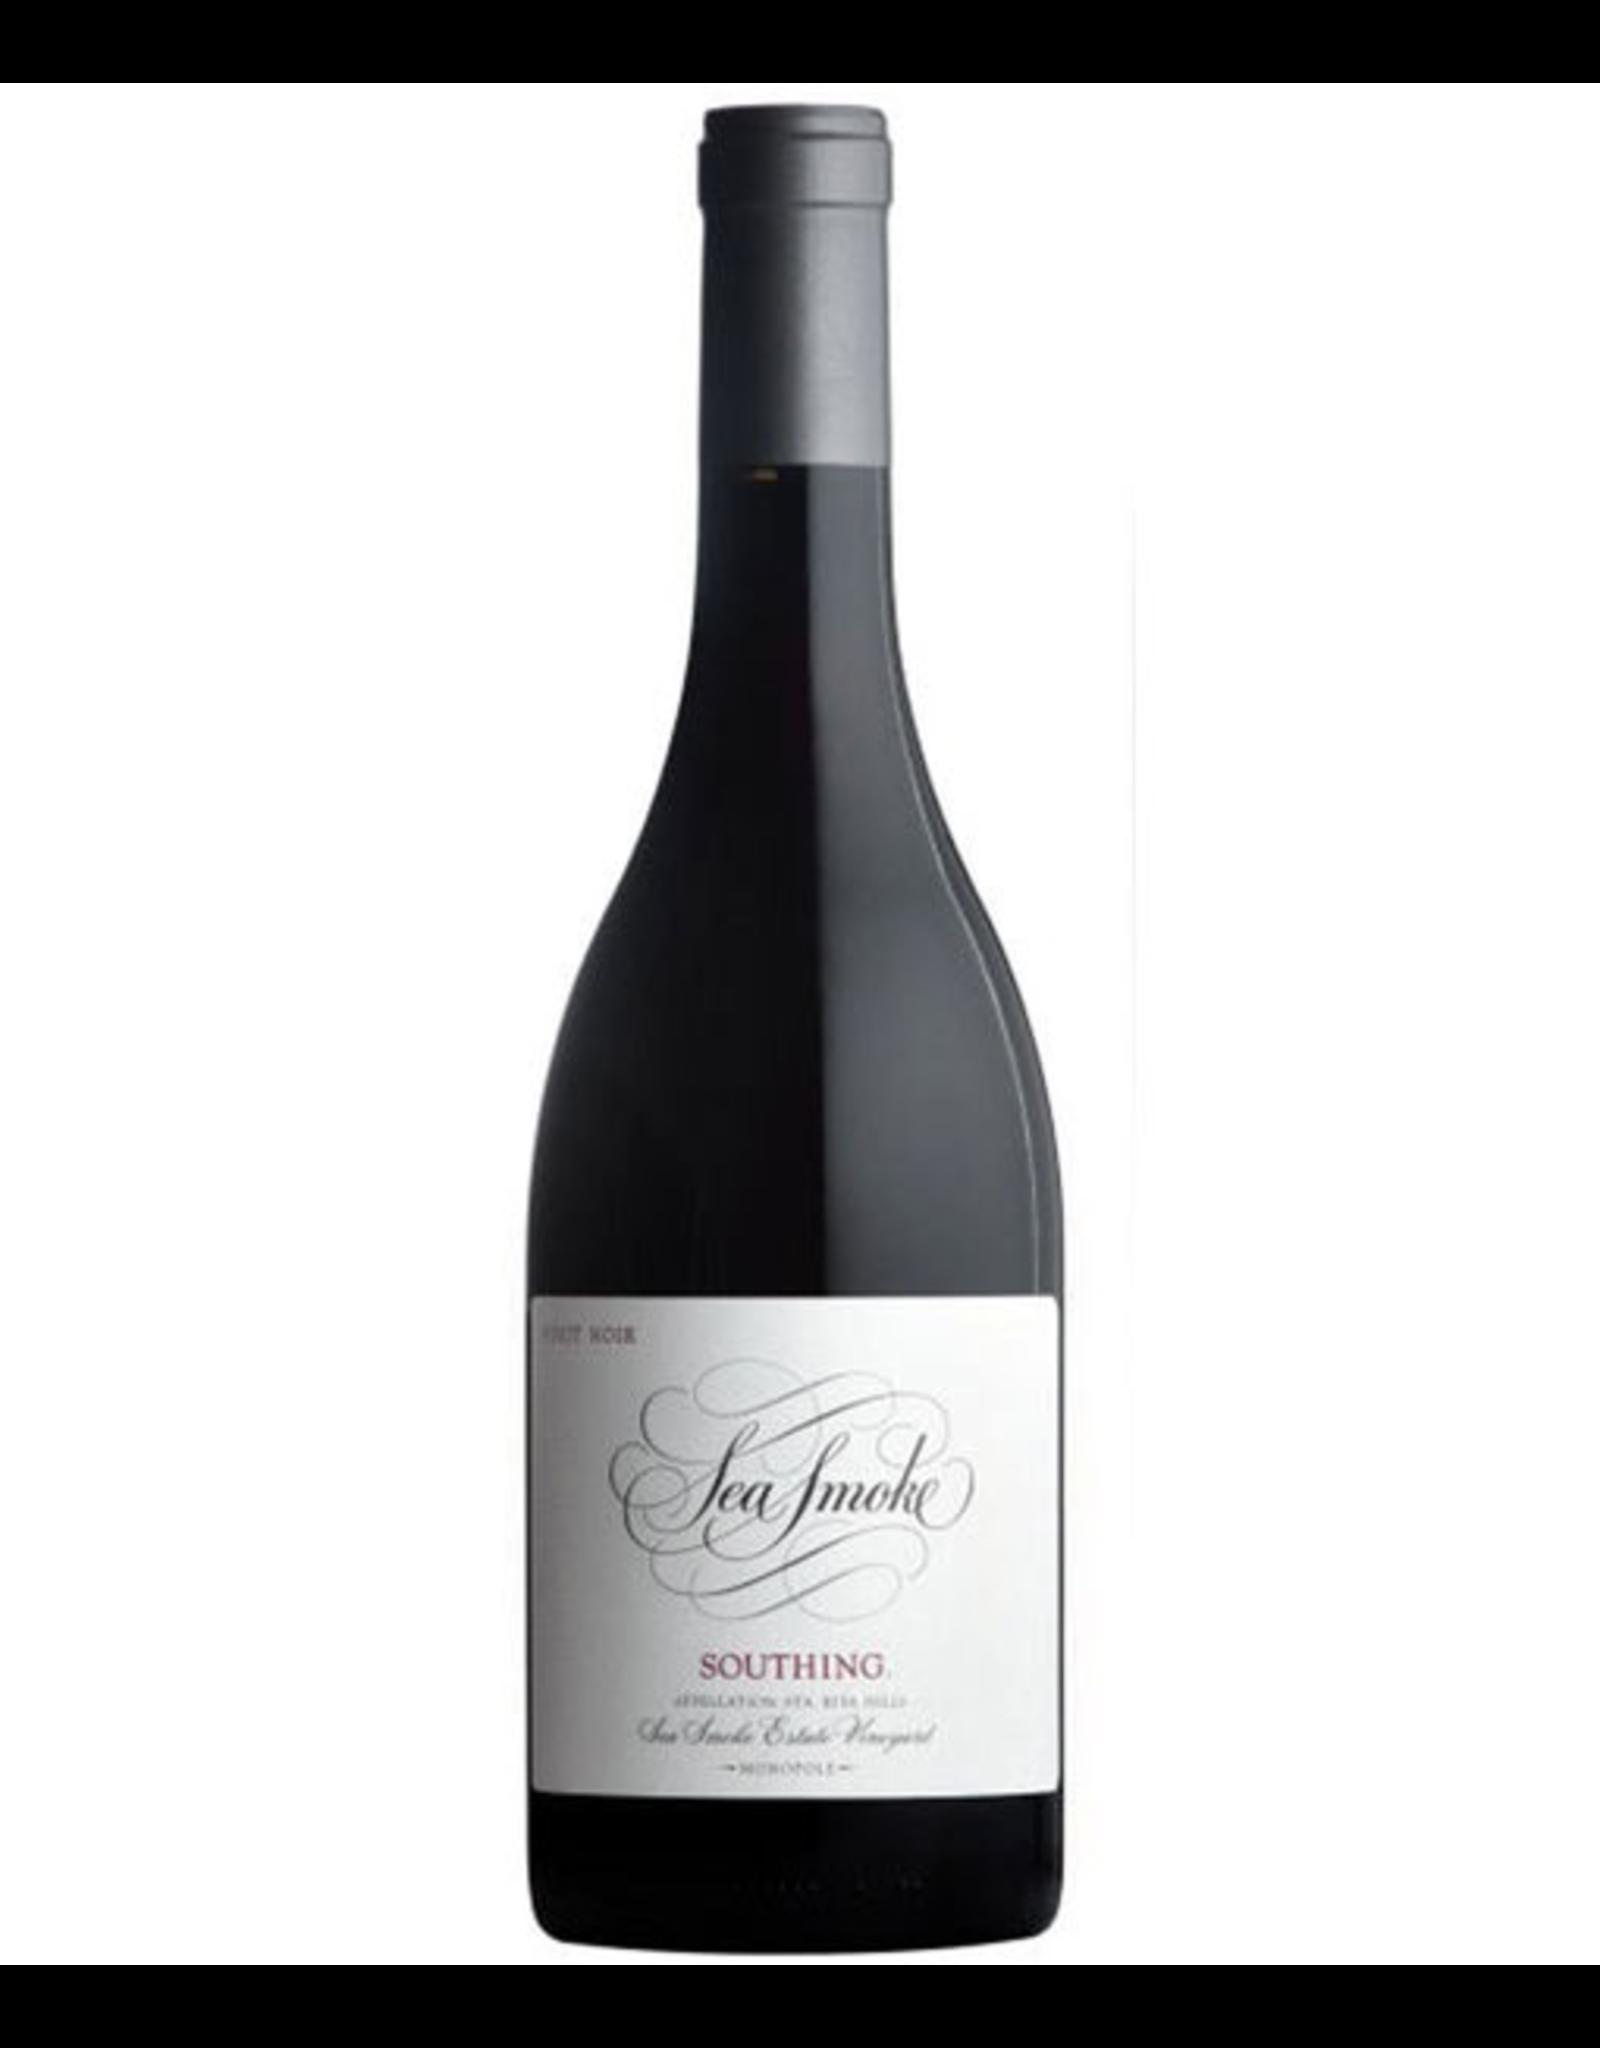 Red Wine 2018, Sea Smoke Southing, Pinot Noir, Sta. Rita Hills, Central Coast, California, 14.5% Alc, CTnr